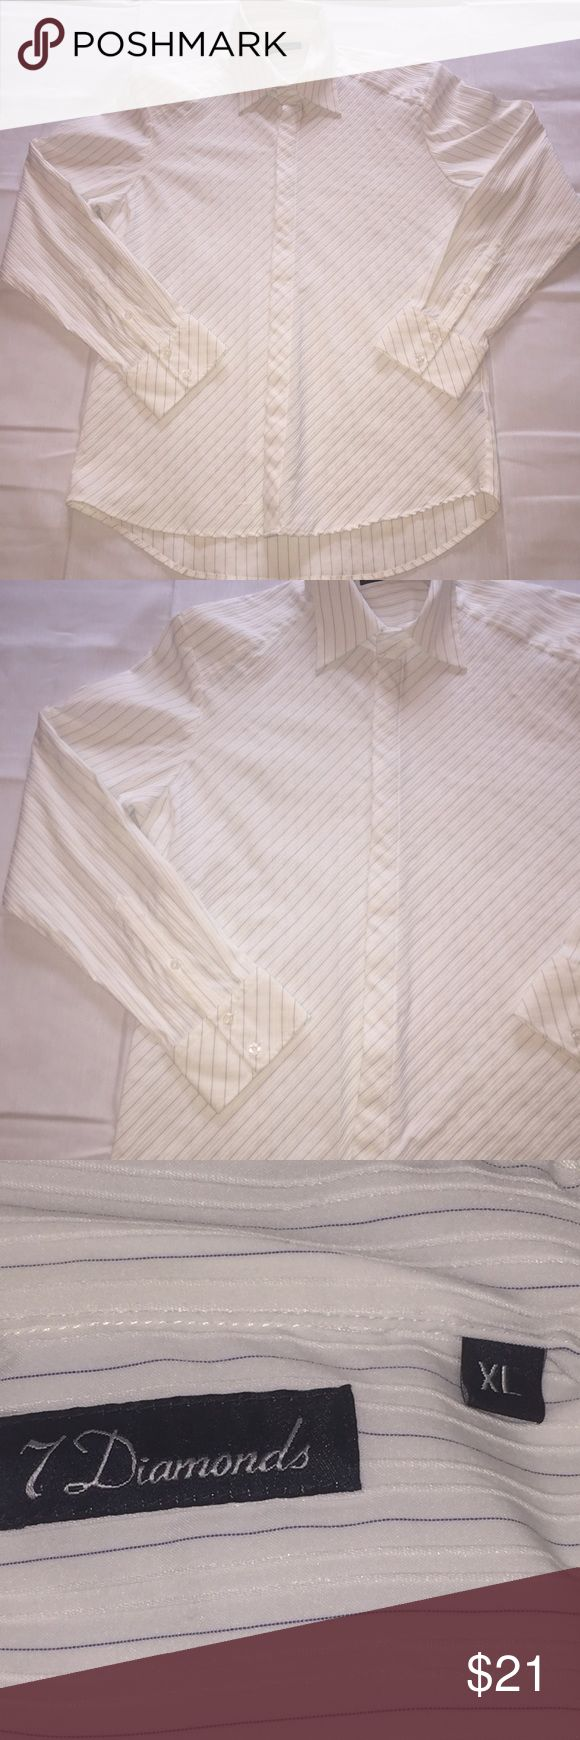 "7 DIAMONDS White Blue Striped Texture XL  Shirt 7 DIAMONDS White Blue Striped Tonal Texture XL Mens Shirt Measurements  Length 32"" Armpit to armpit 22"" 7 Diamonds Shirts Casual Button Down Shirts"